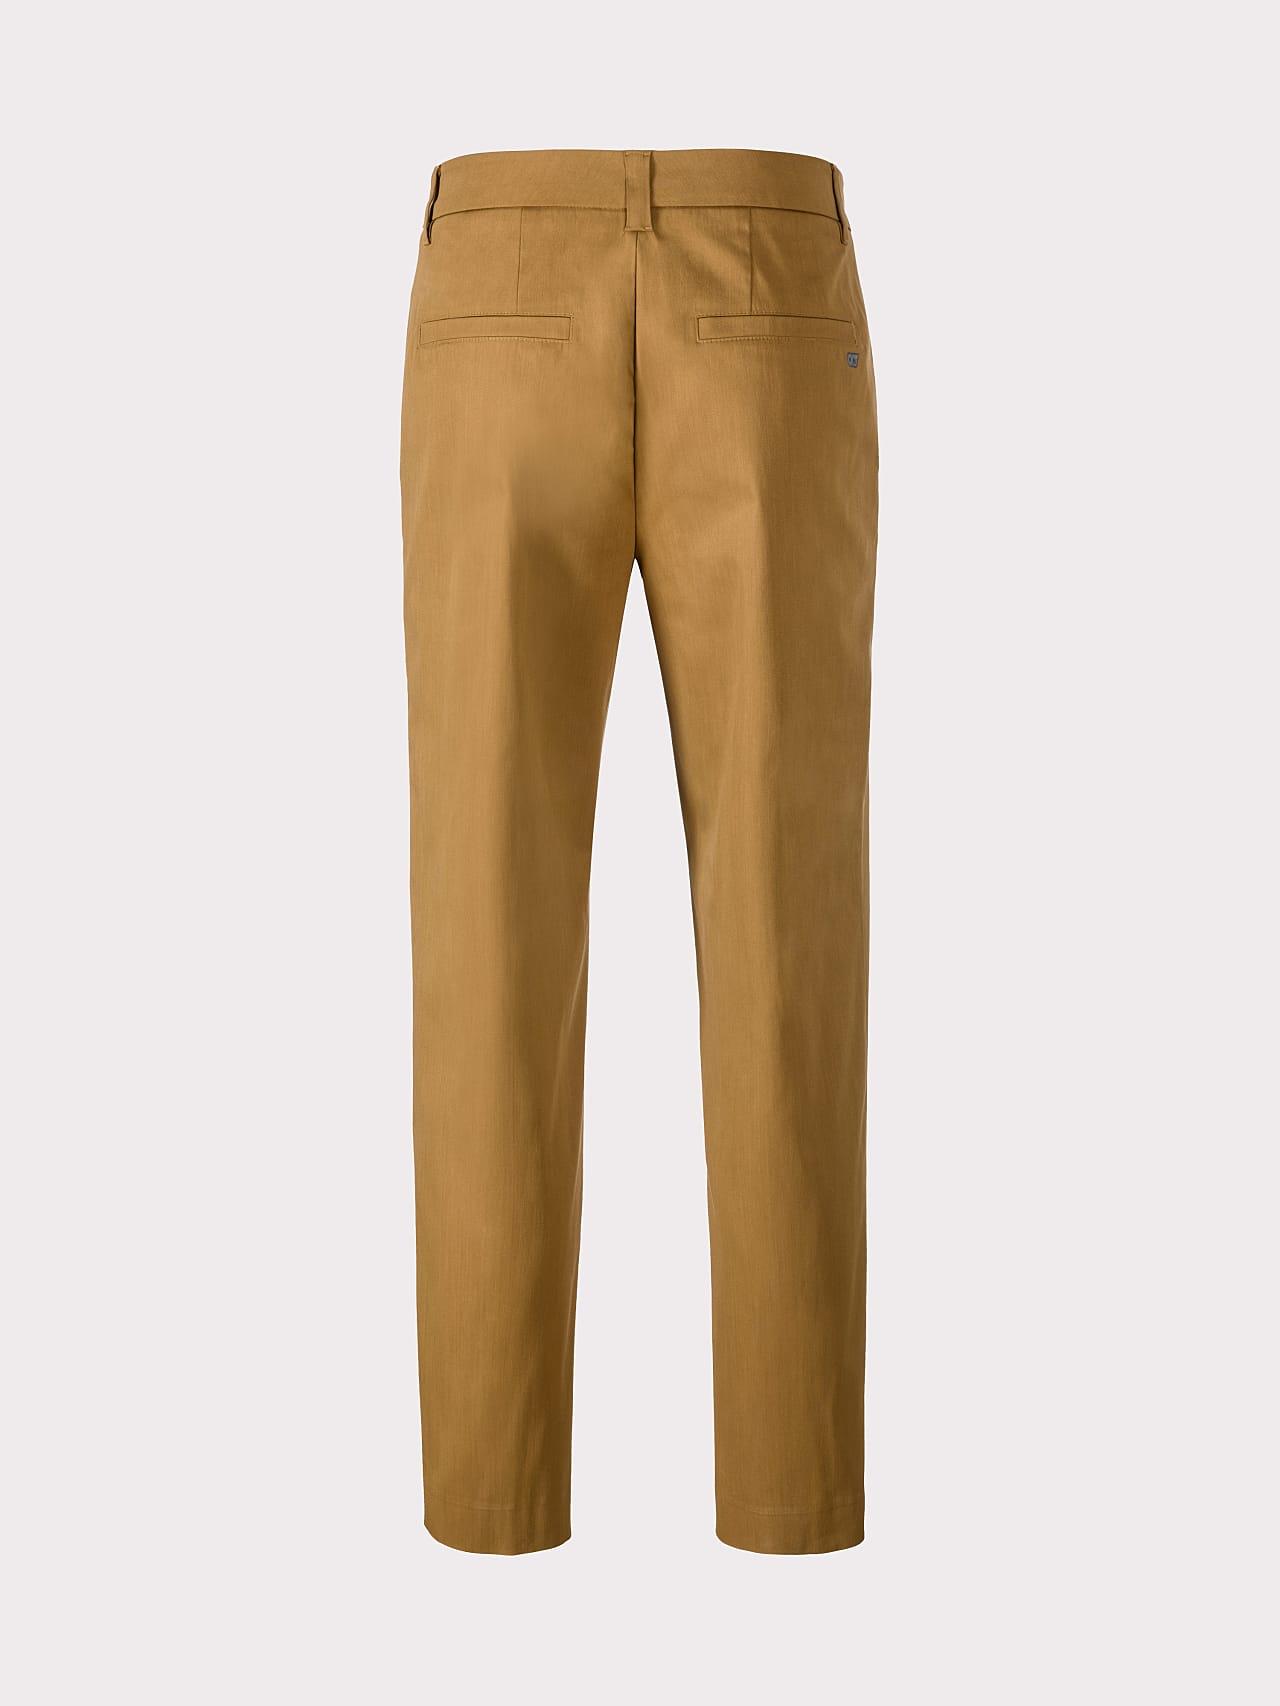 PLAIZ V2.Y5.01 Water-Repellent Cotton-Stretch Chino brown Left Alpha Tauri